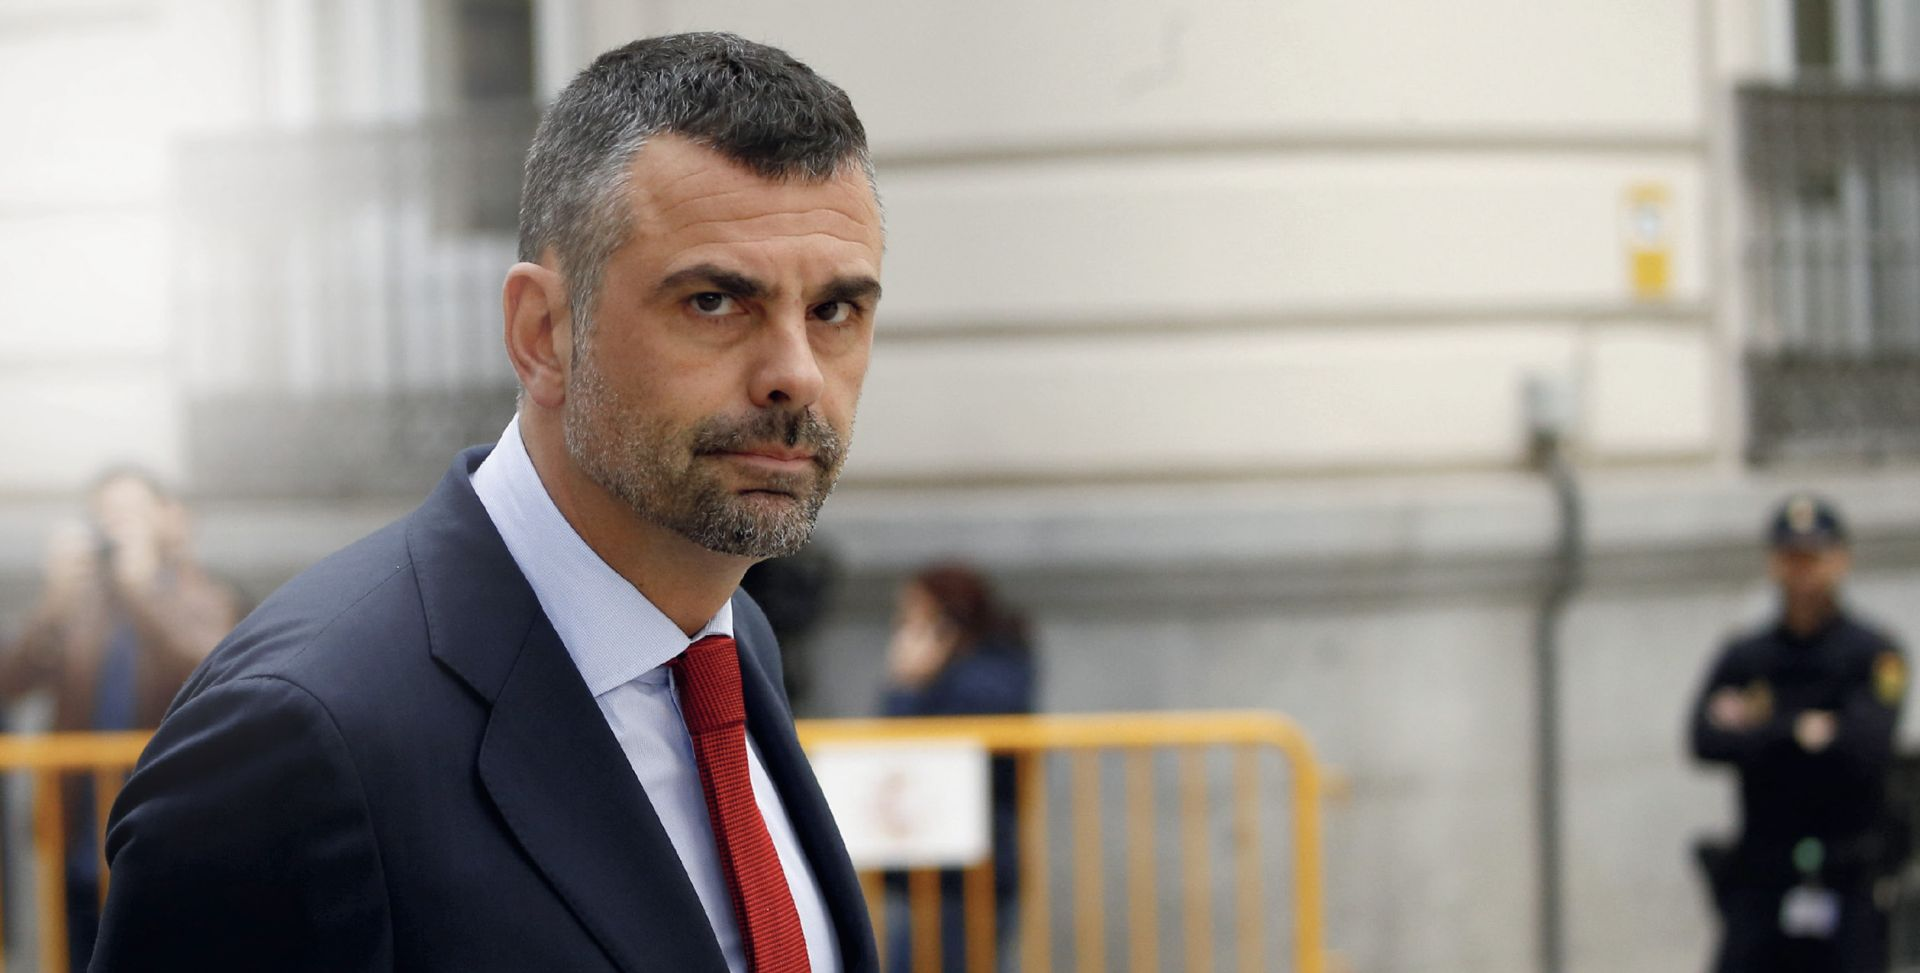 INTERVIEW: SANTI VILA 'Nezavisnu Kataloniju želimo i Puigdemont i ja, ali je on preradikalan'